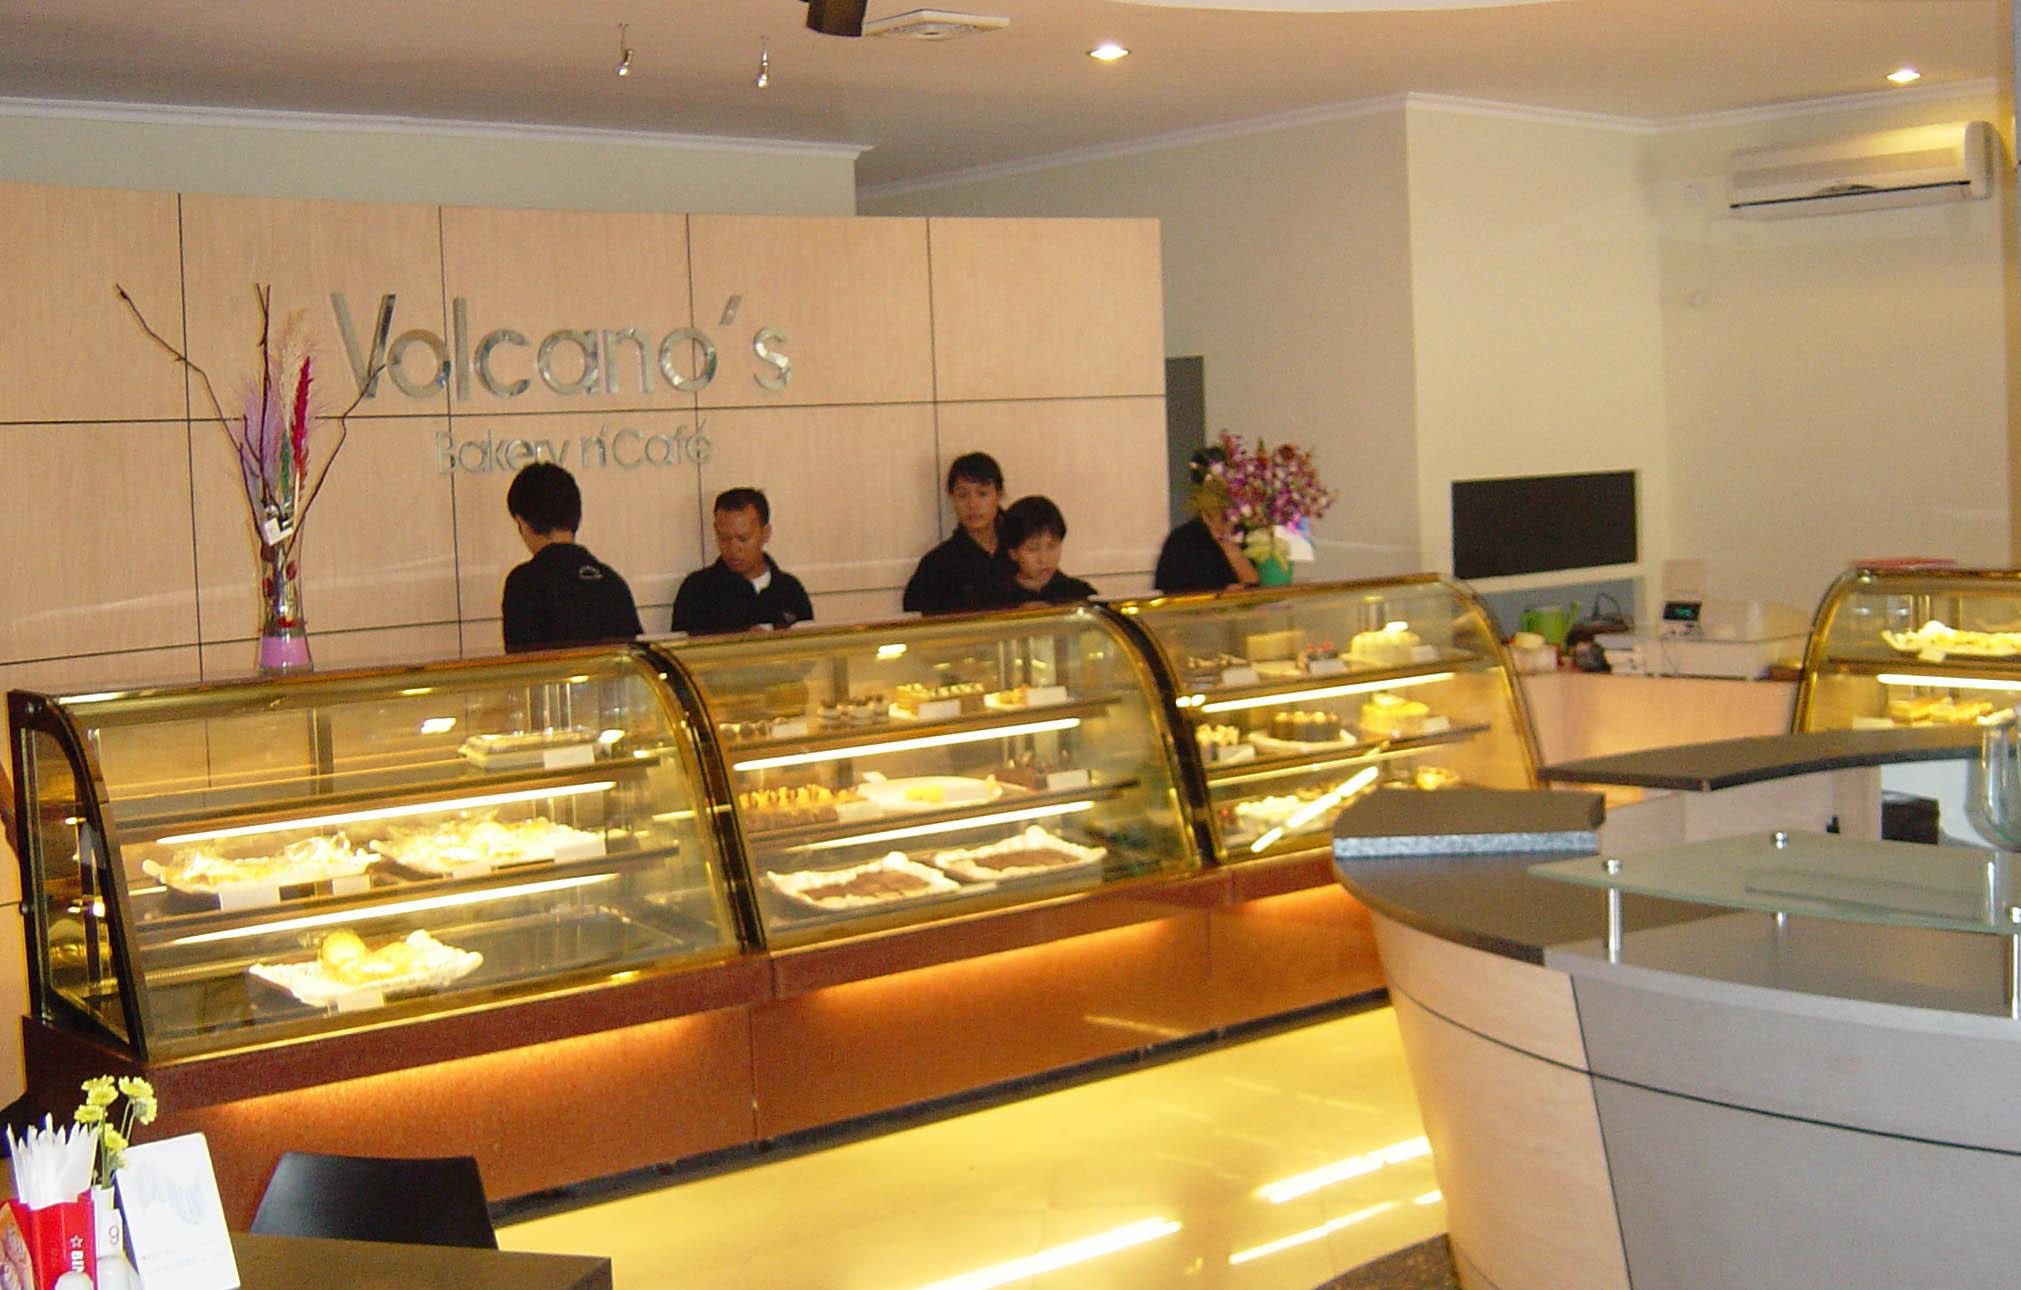 Volcanoes Bakery & Cafe